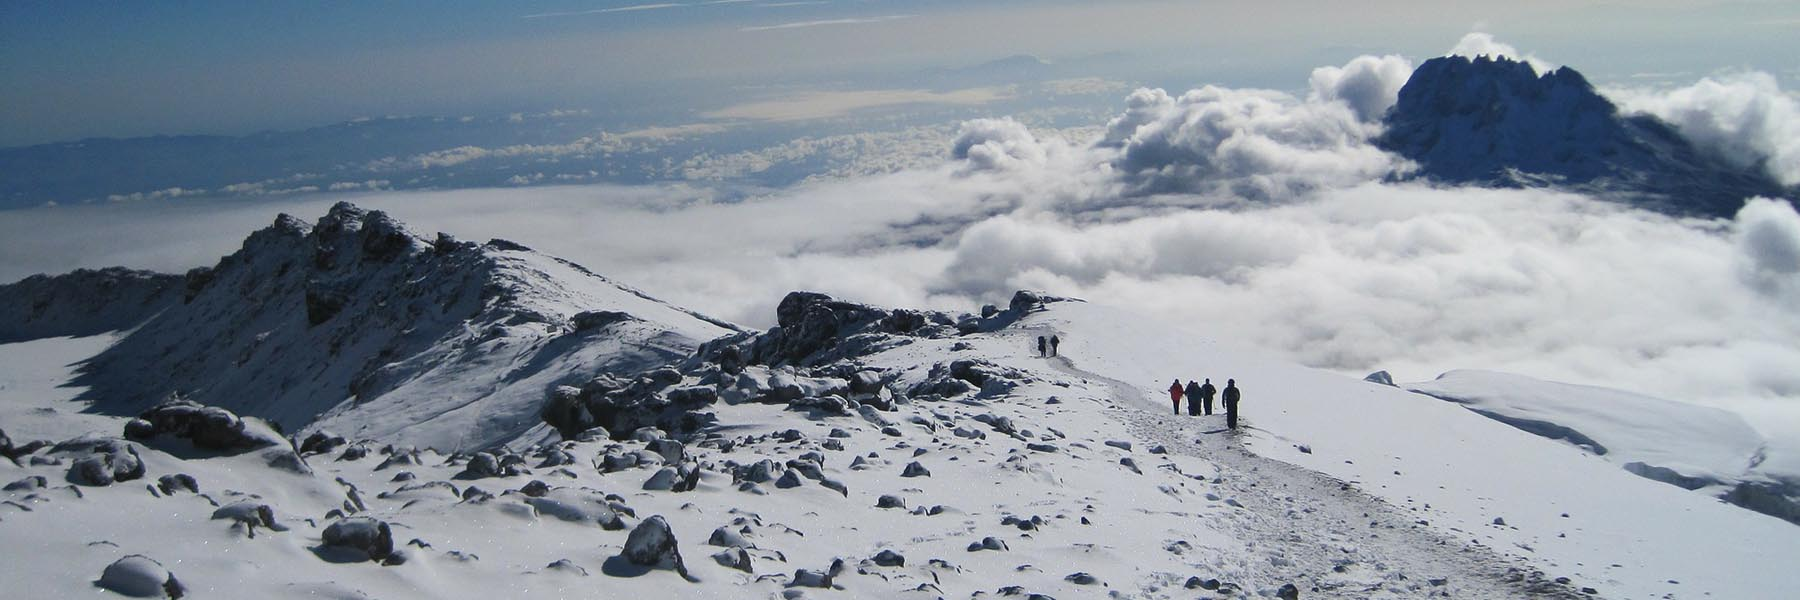 Rongai route Kilimanjaro Trek